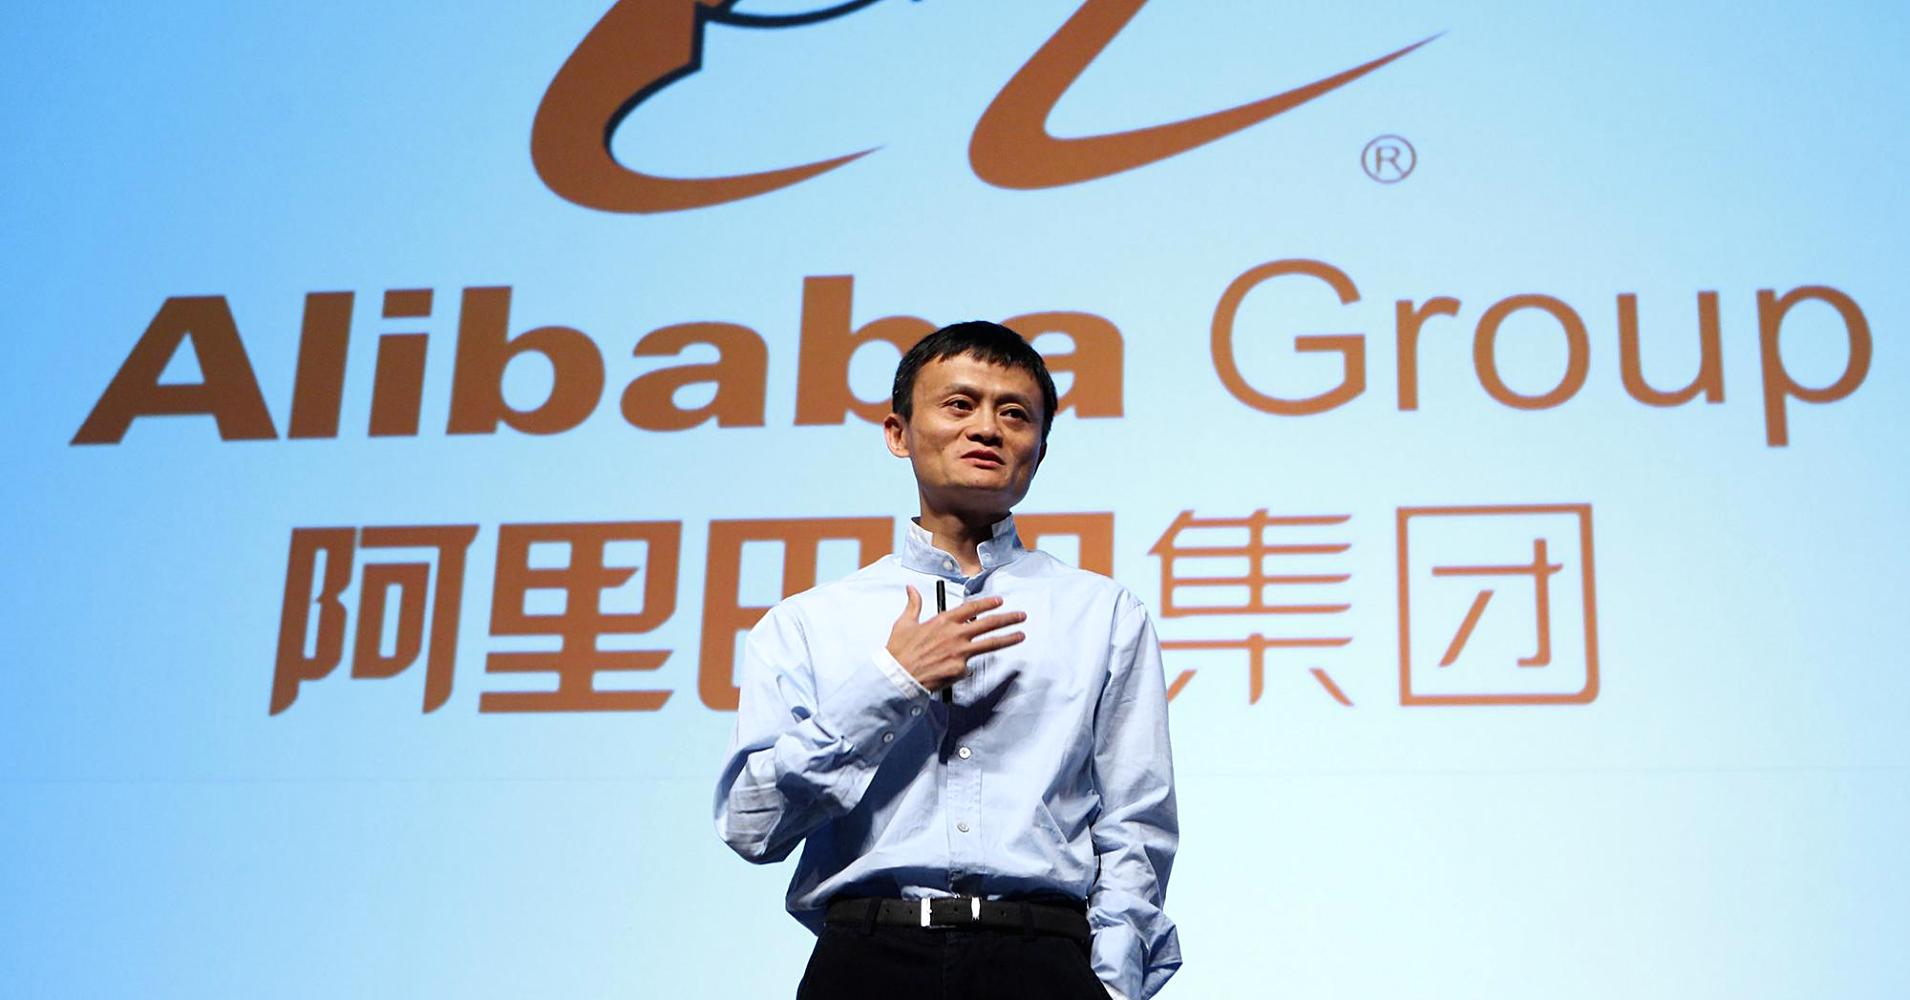 101975912-alibaba-group-jack-ma.1910x1000